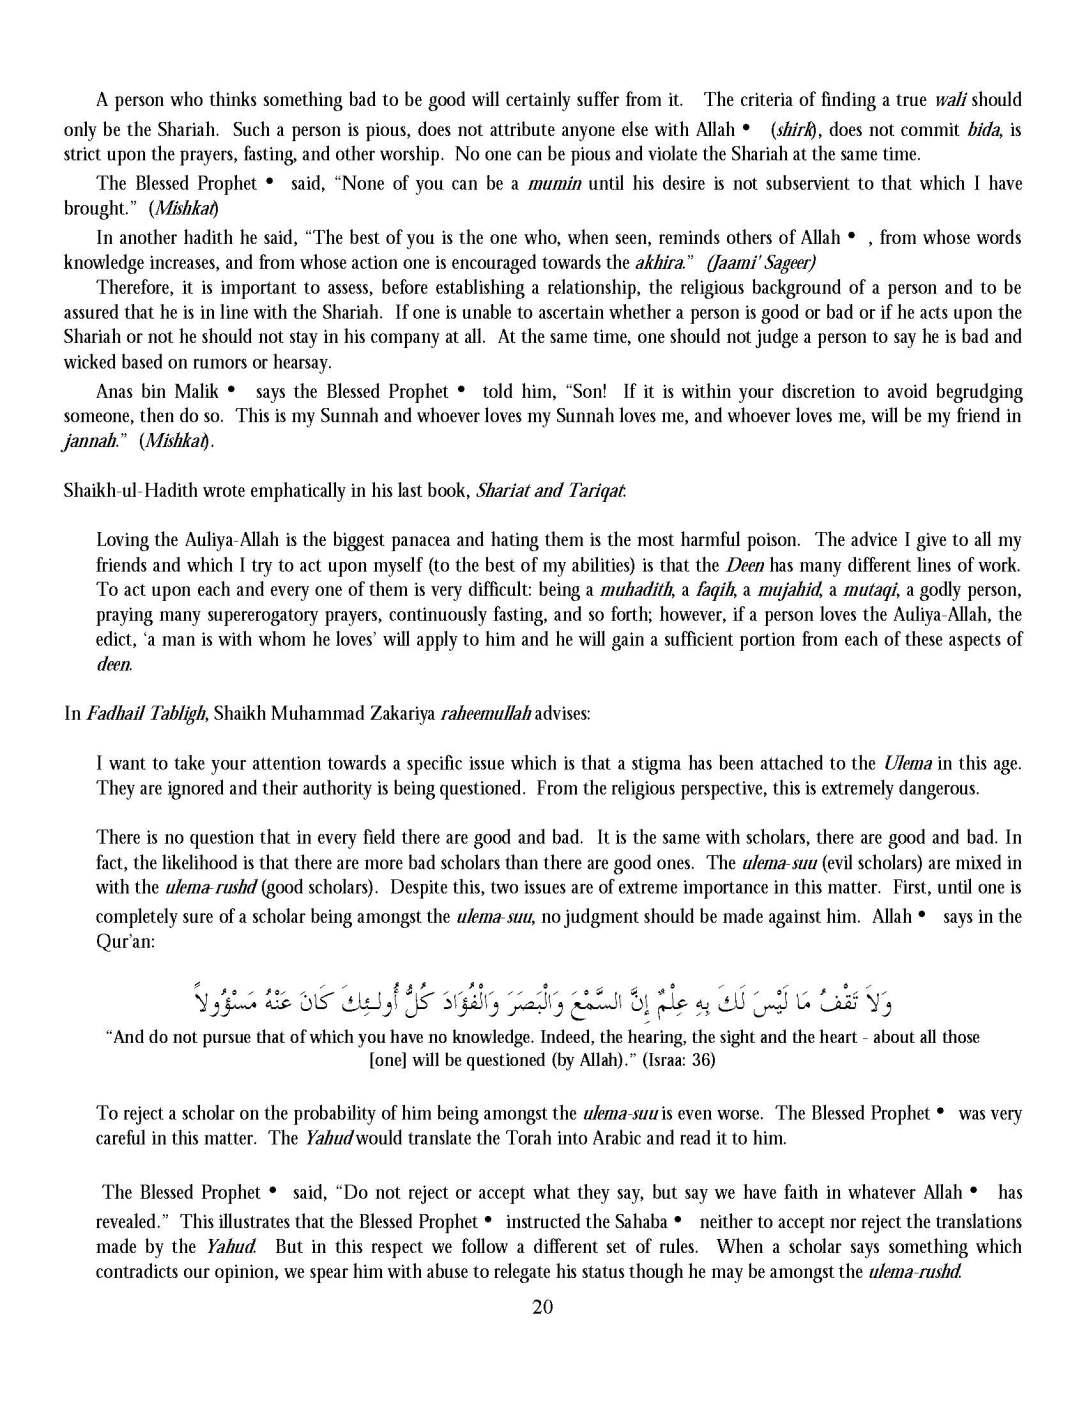 ConsequencesOfDebasingAuliyaAllah_Page_21